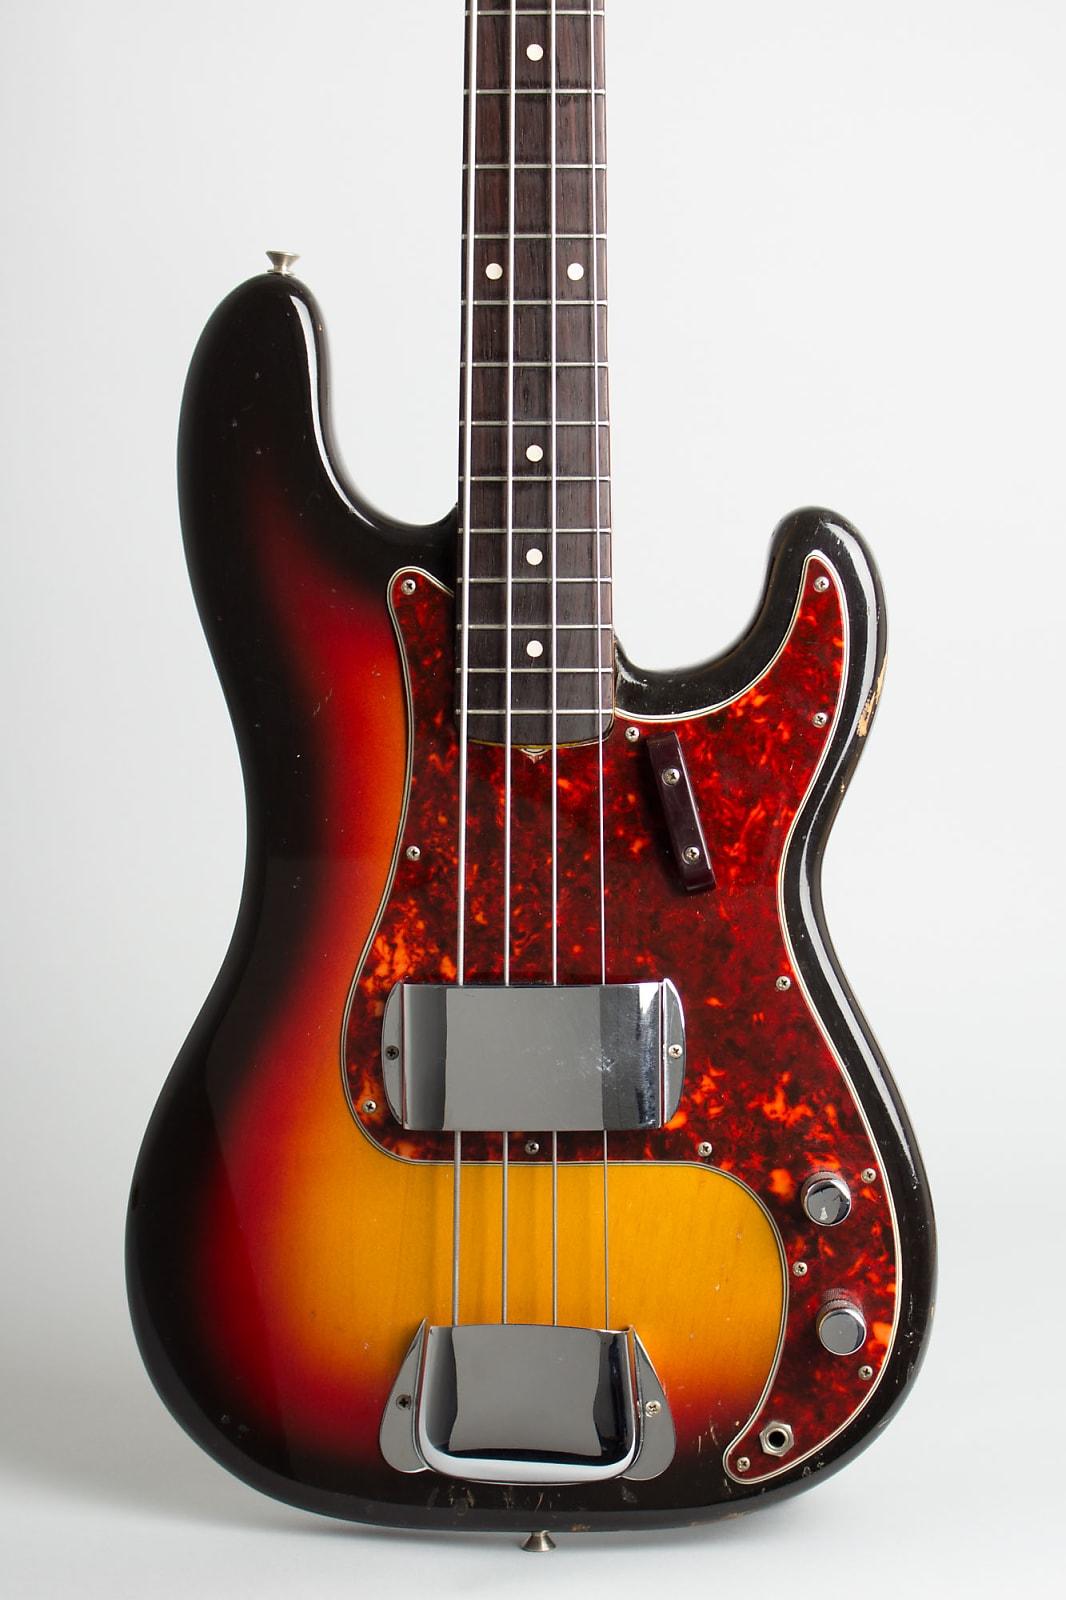 Fender  Precision Bass Solid Body Electric Bass Guitar (1963), ser. #92338, period black tolex hard shell case.